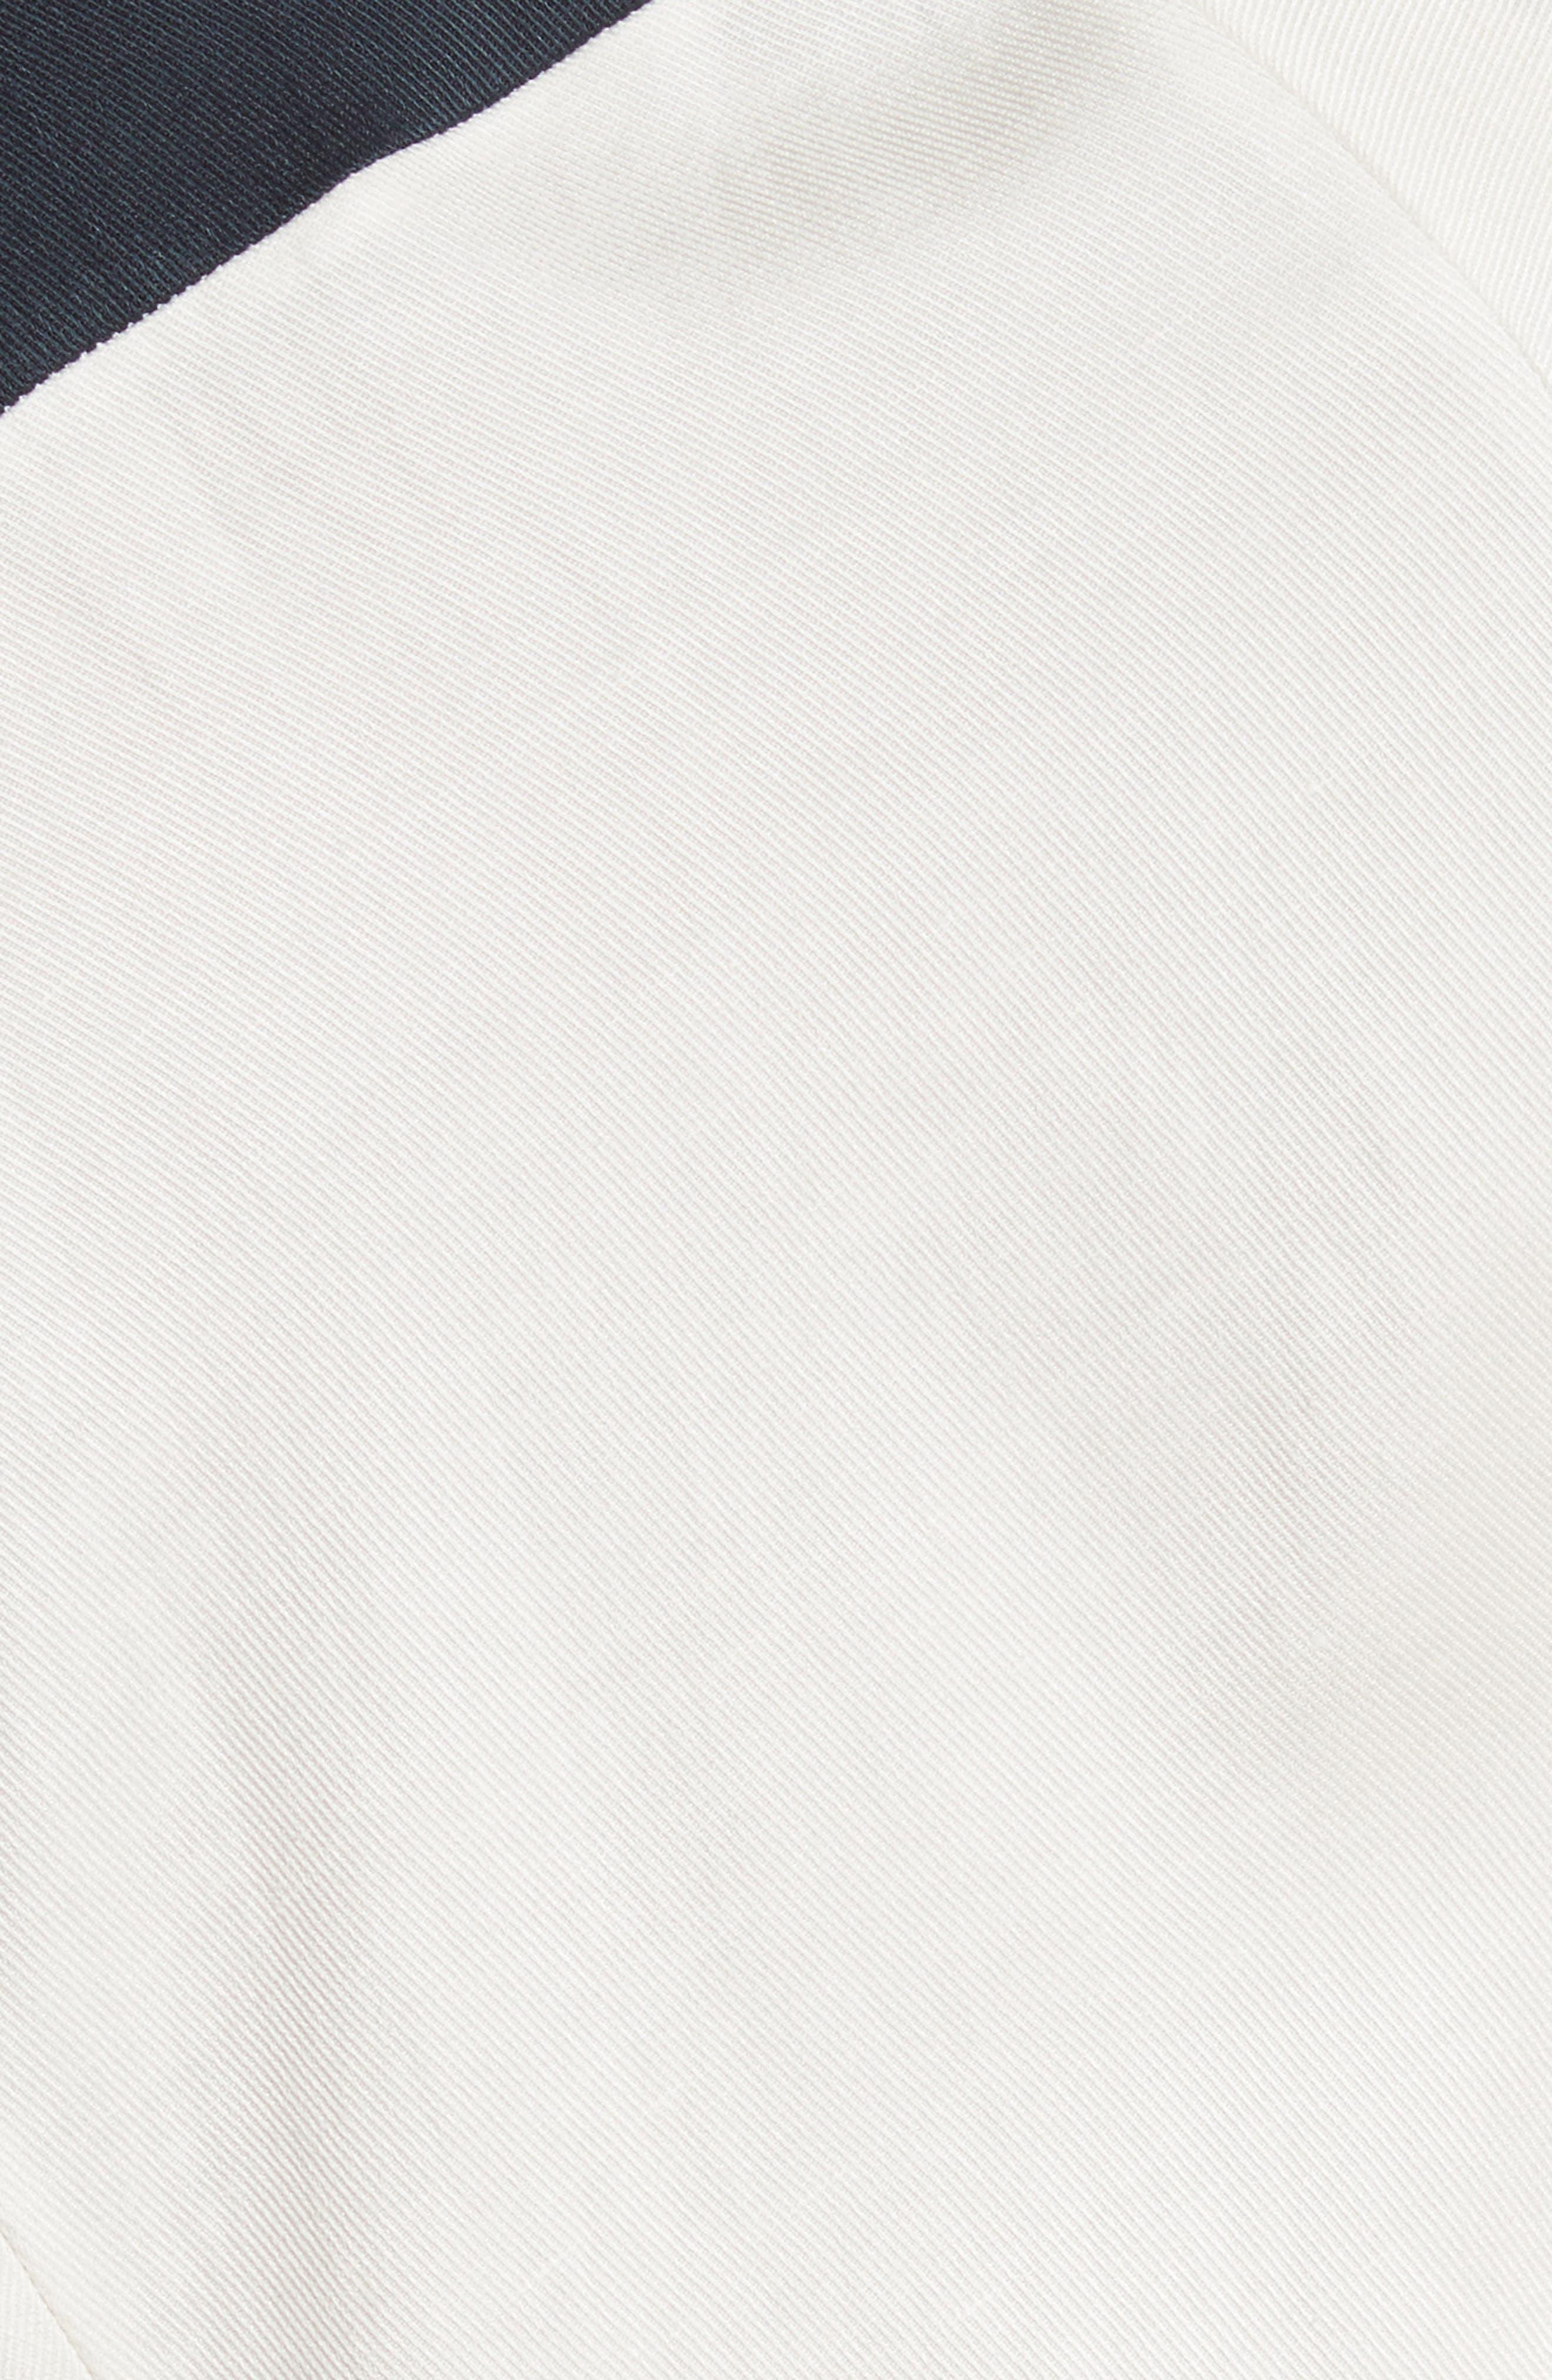 Colorblock Drape Dress,                             Alternate thumbnail 6, color,                             Ink/ White Pepper